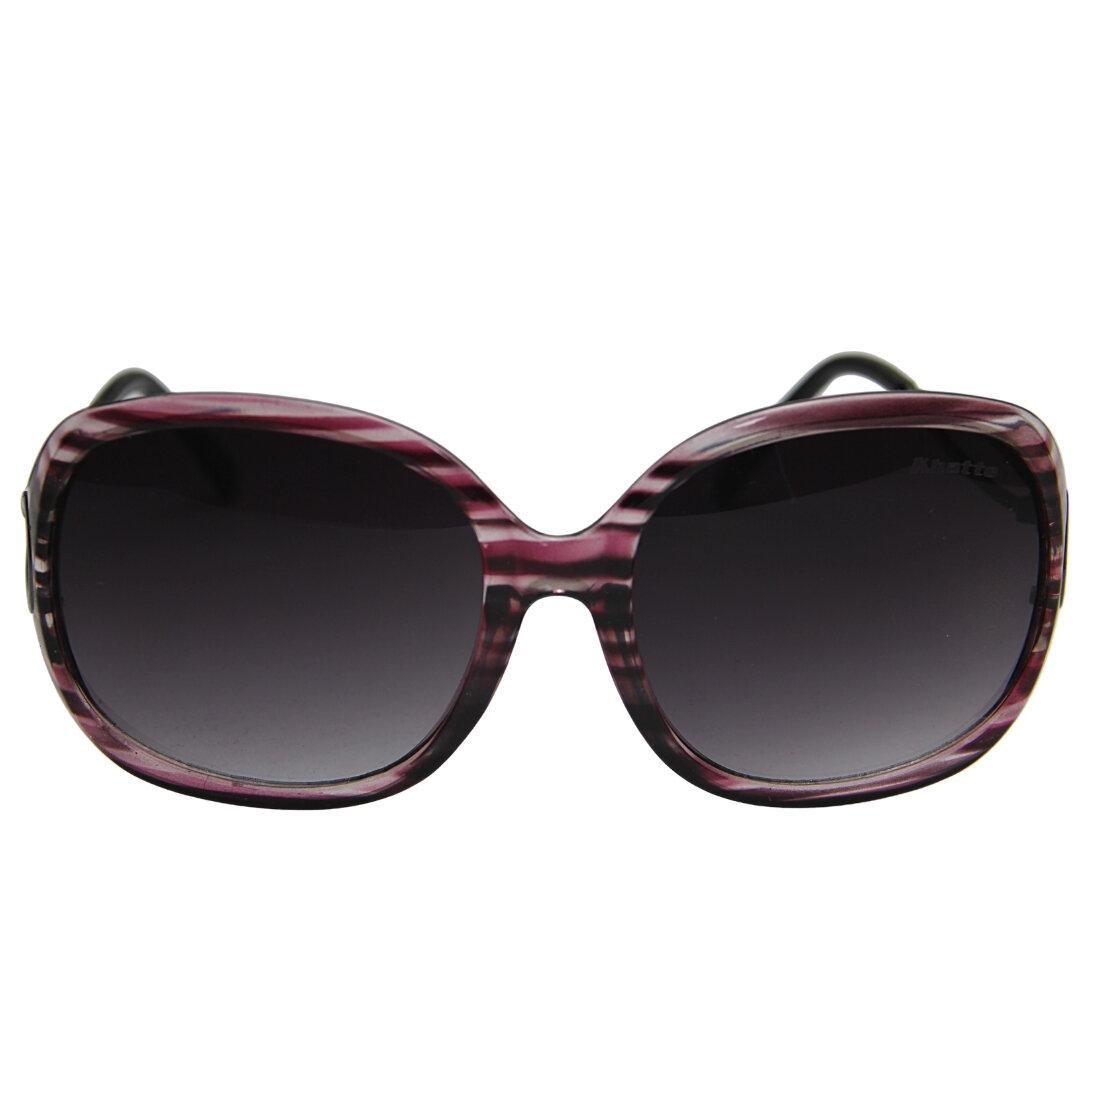 Óculos de Sol Khatto Woman Maria Eduarda - PU